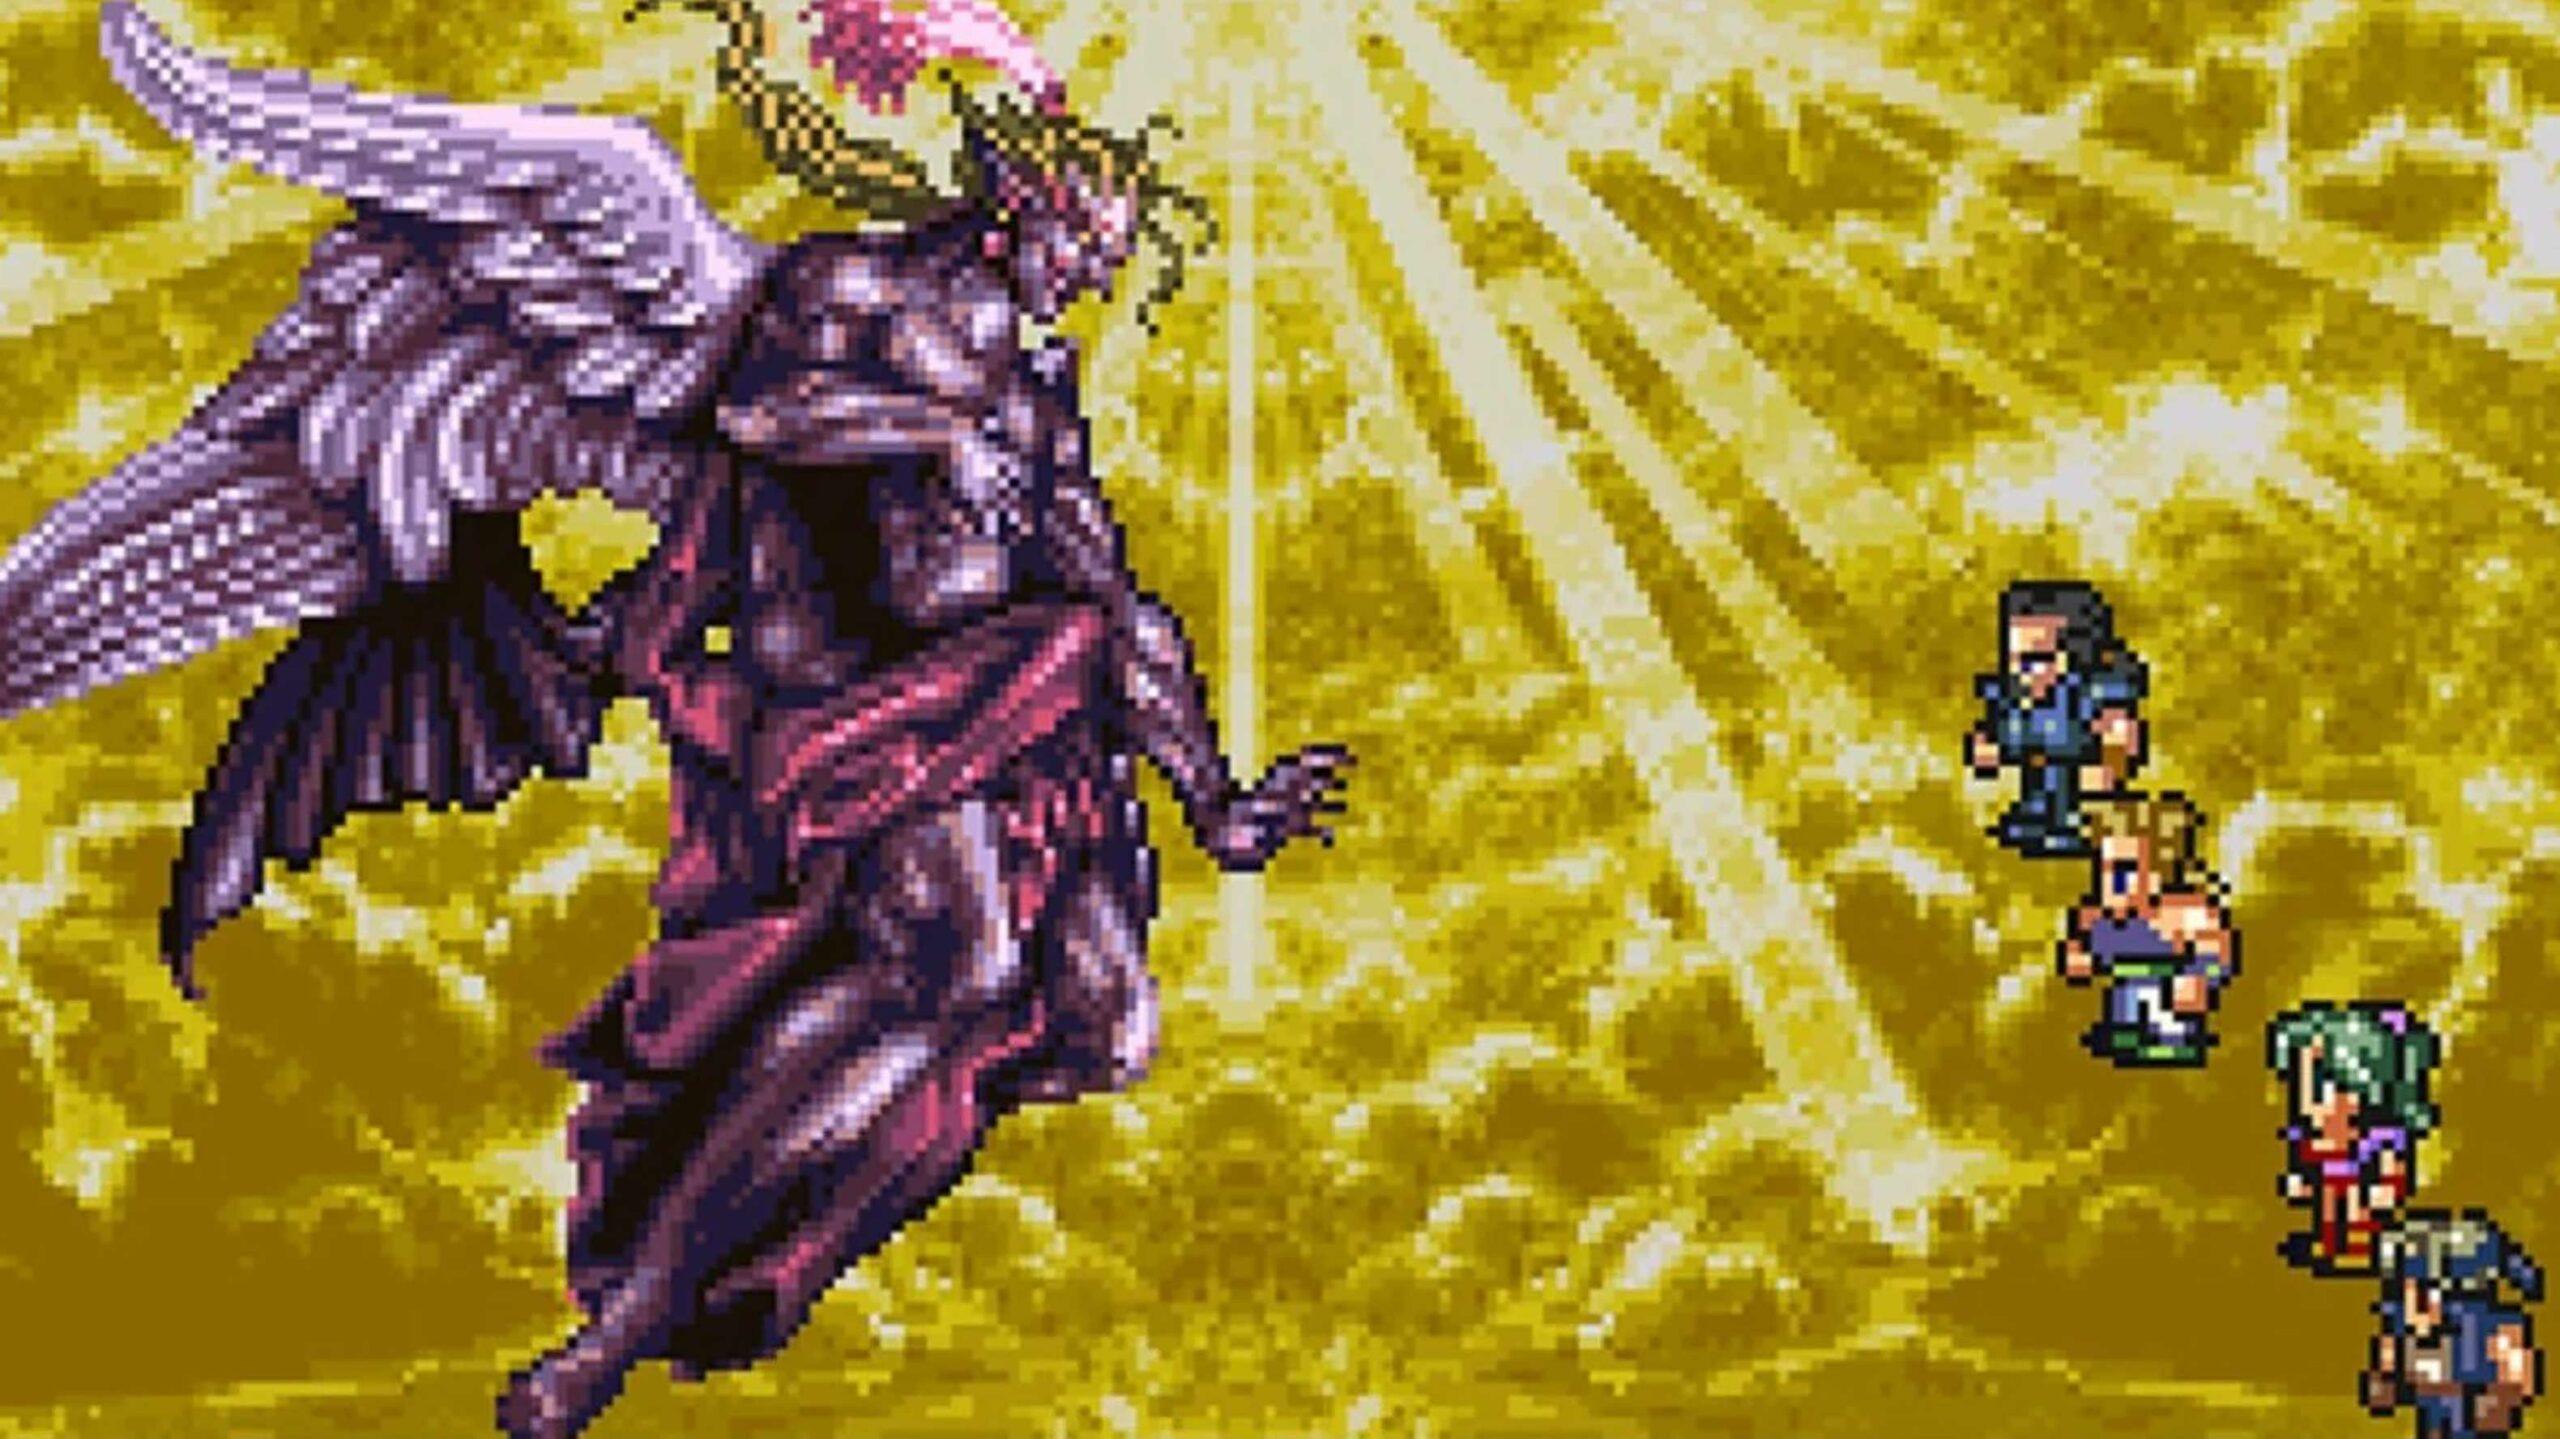 Final Fantasy VI final boss Kefka